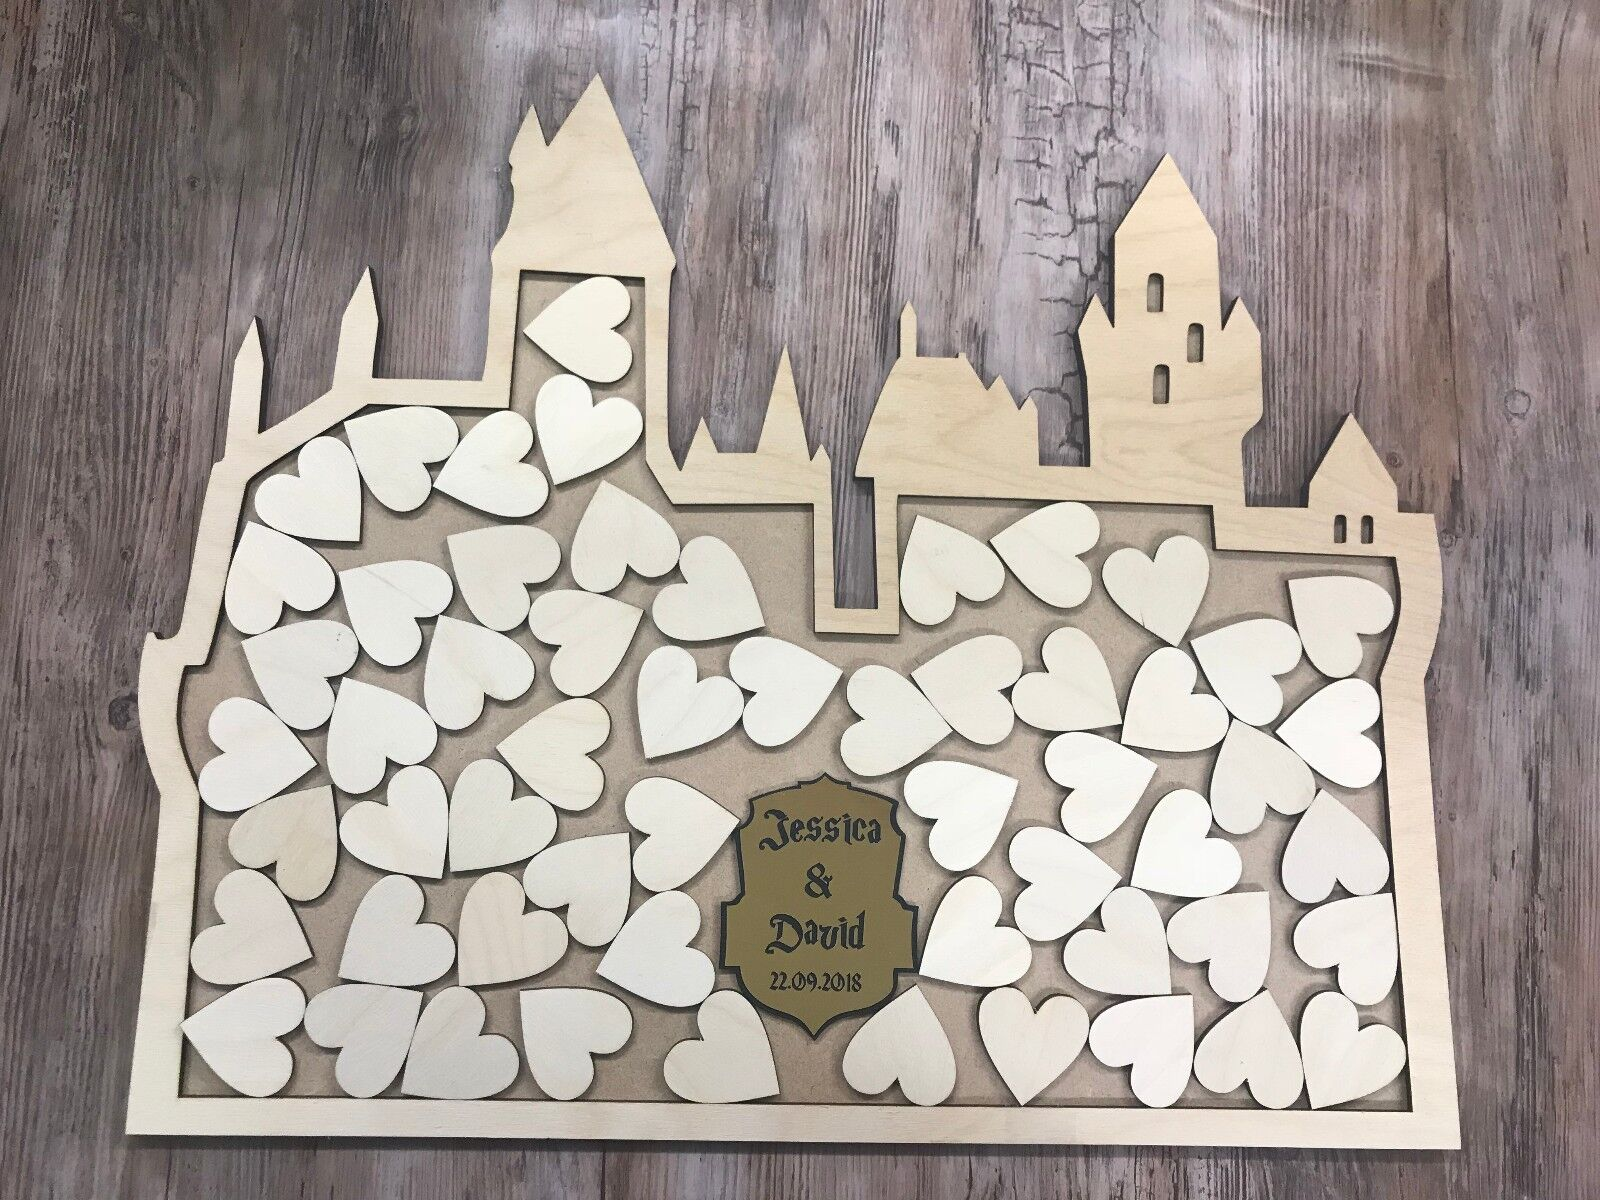 Harry Potter Inspirouge Hogwarts Castle mariage drop box alternative guest book